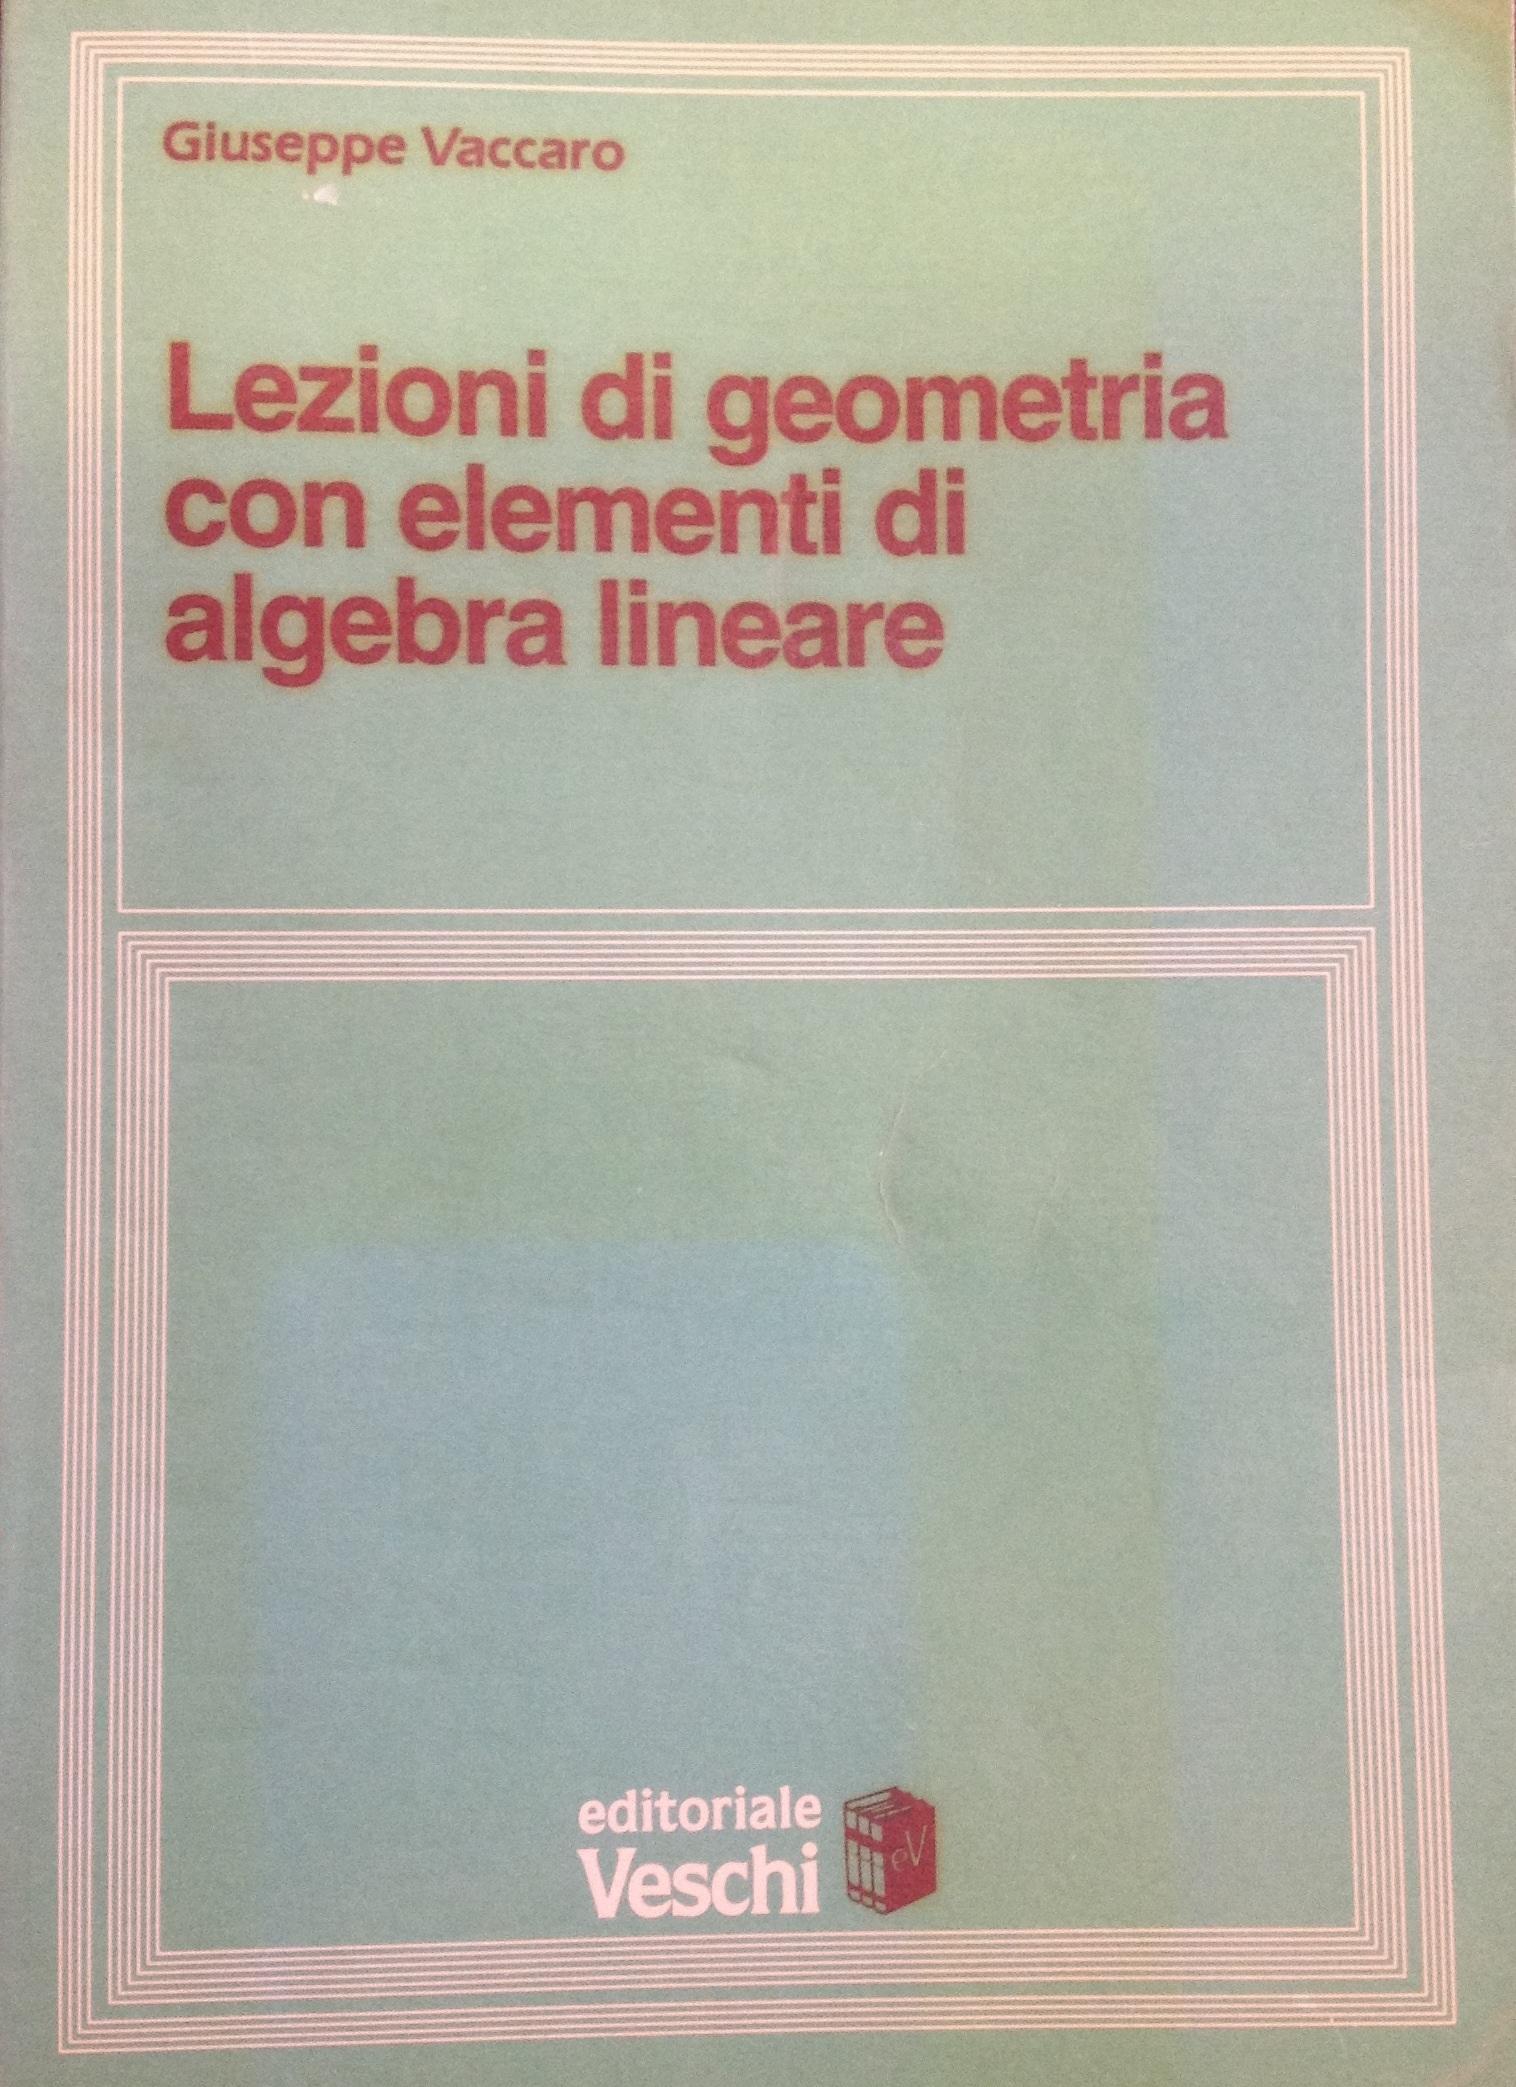 Lezioni di geometria. Elementi di algebra lineare